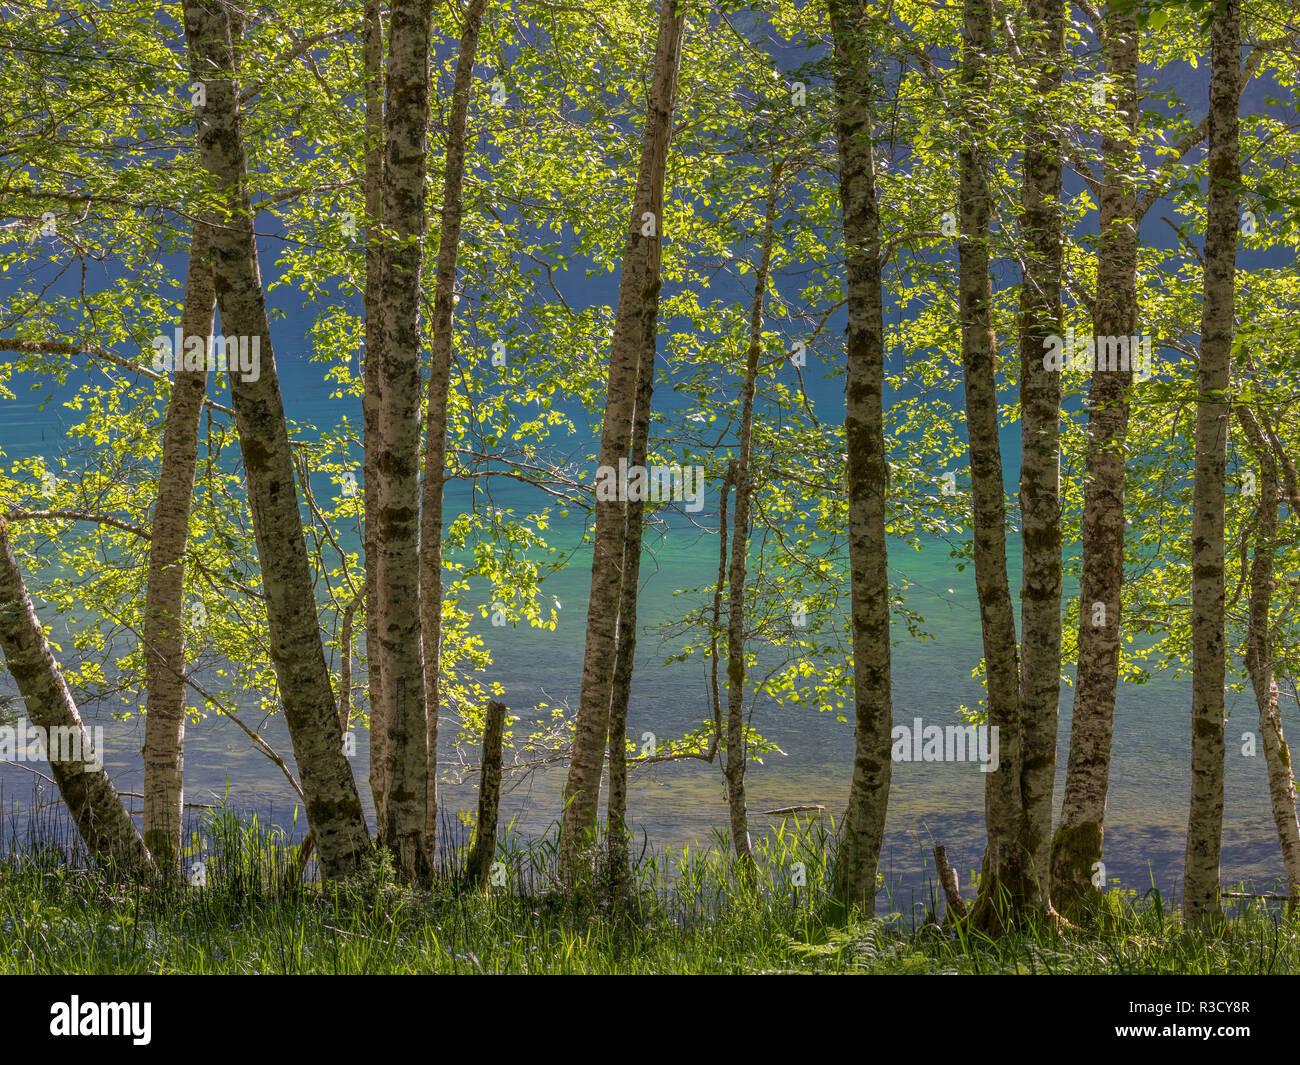 Usa Wa Olympic National Park Alder Trees On Lake Shore Stock Photo Alamy